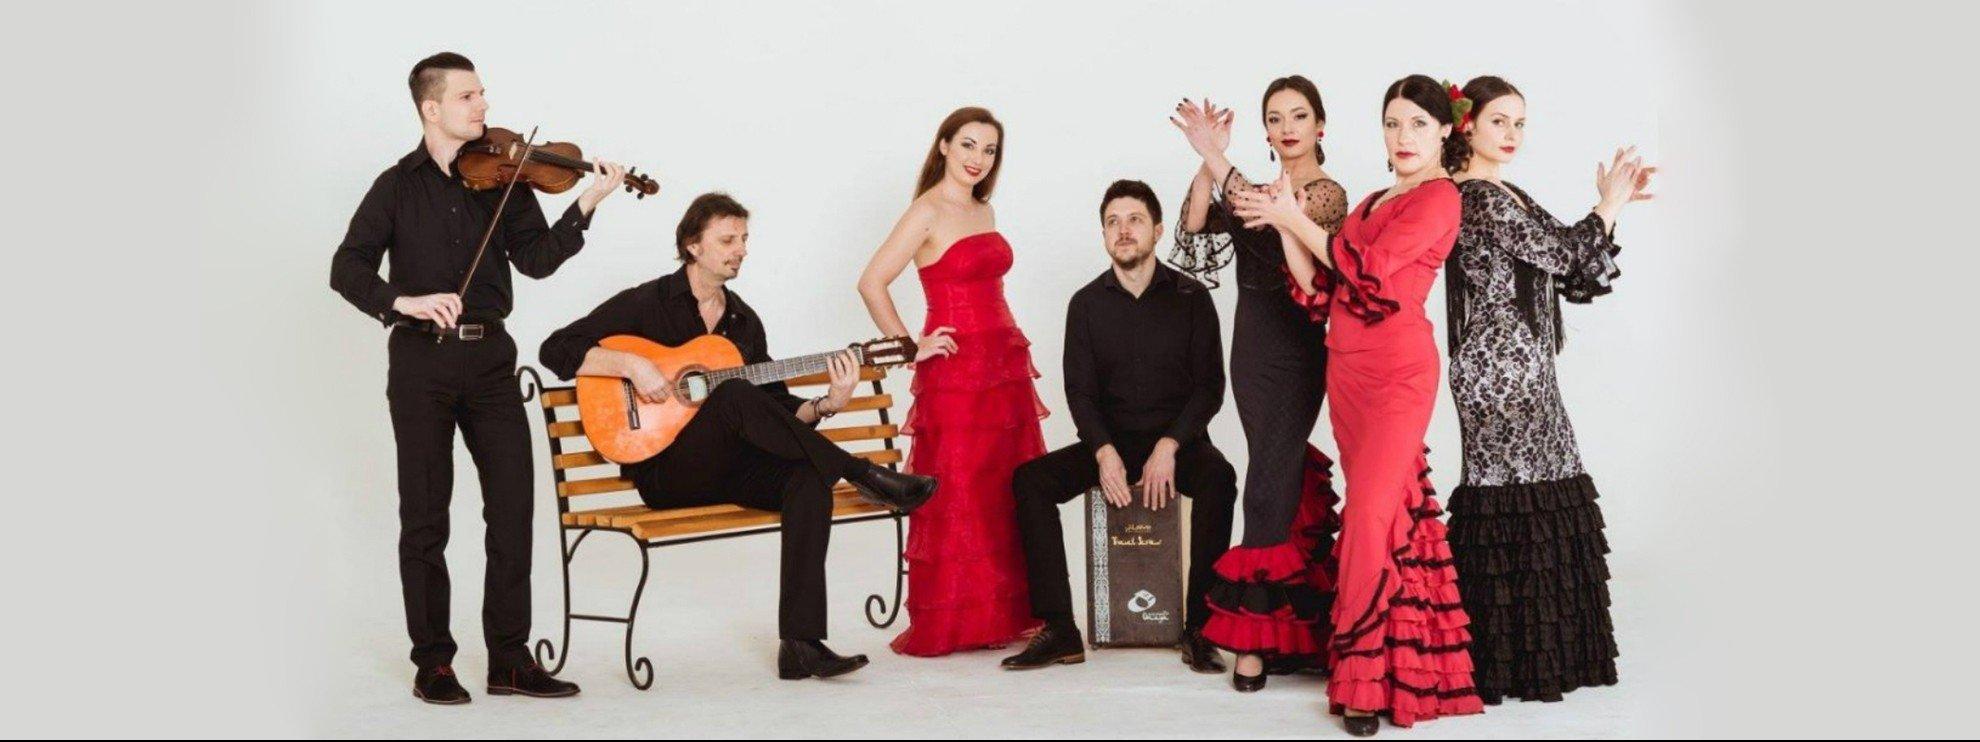 performer Piano Flamenco Band